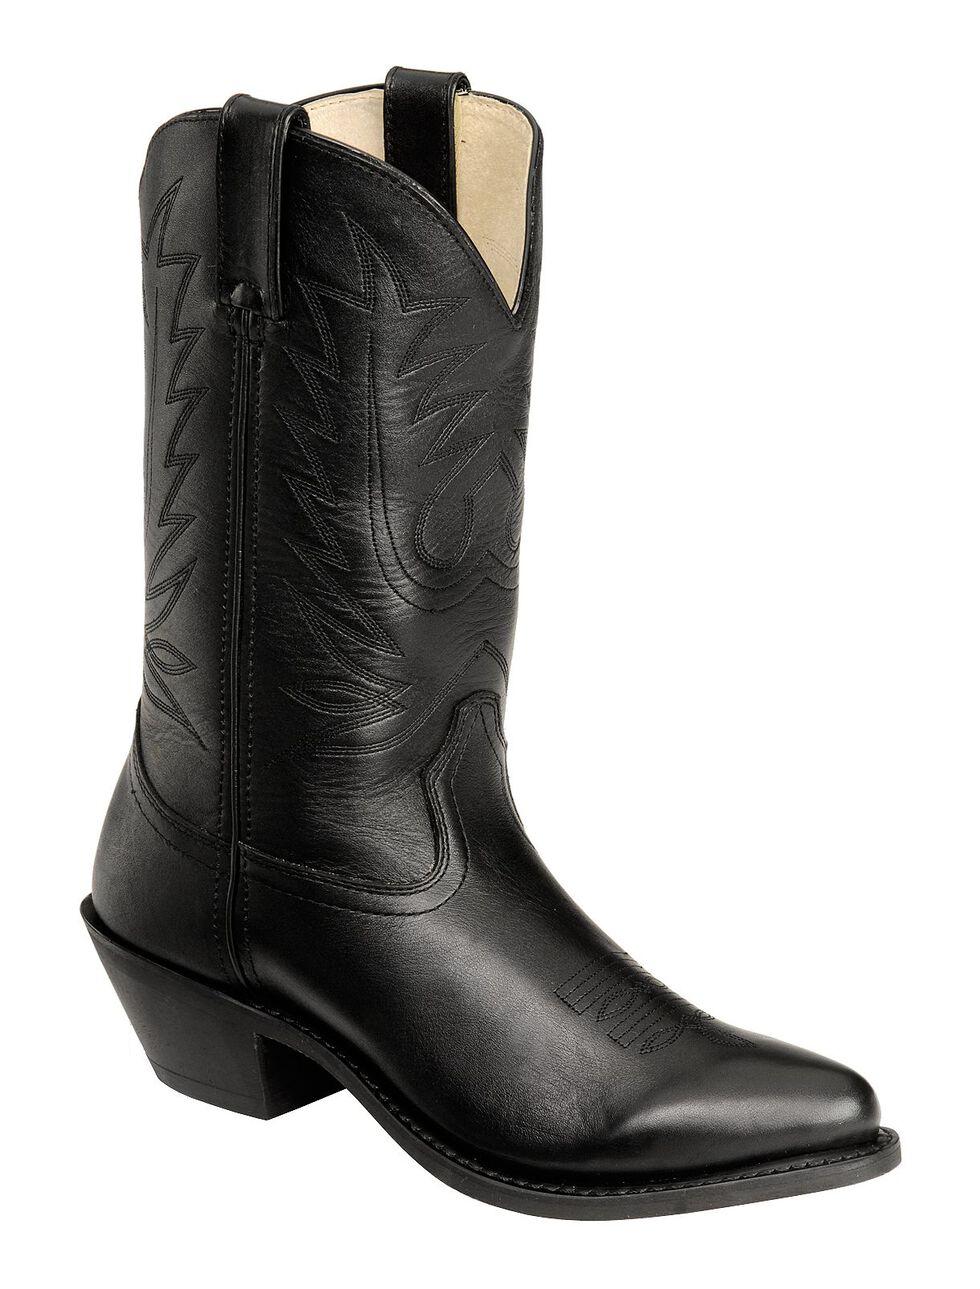 Durango Black Western Cowgirl Boots - Round Toe, Black, hi-res